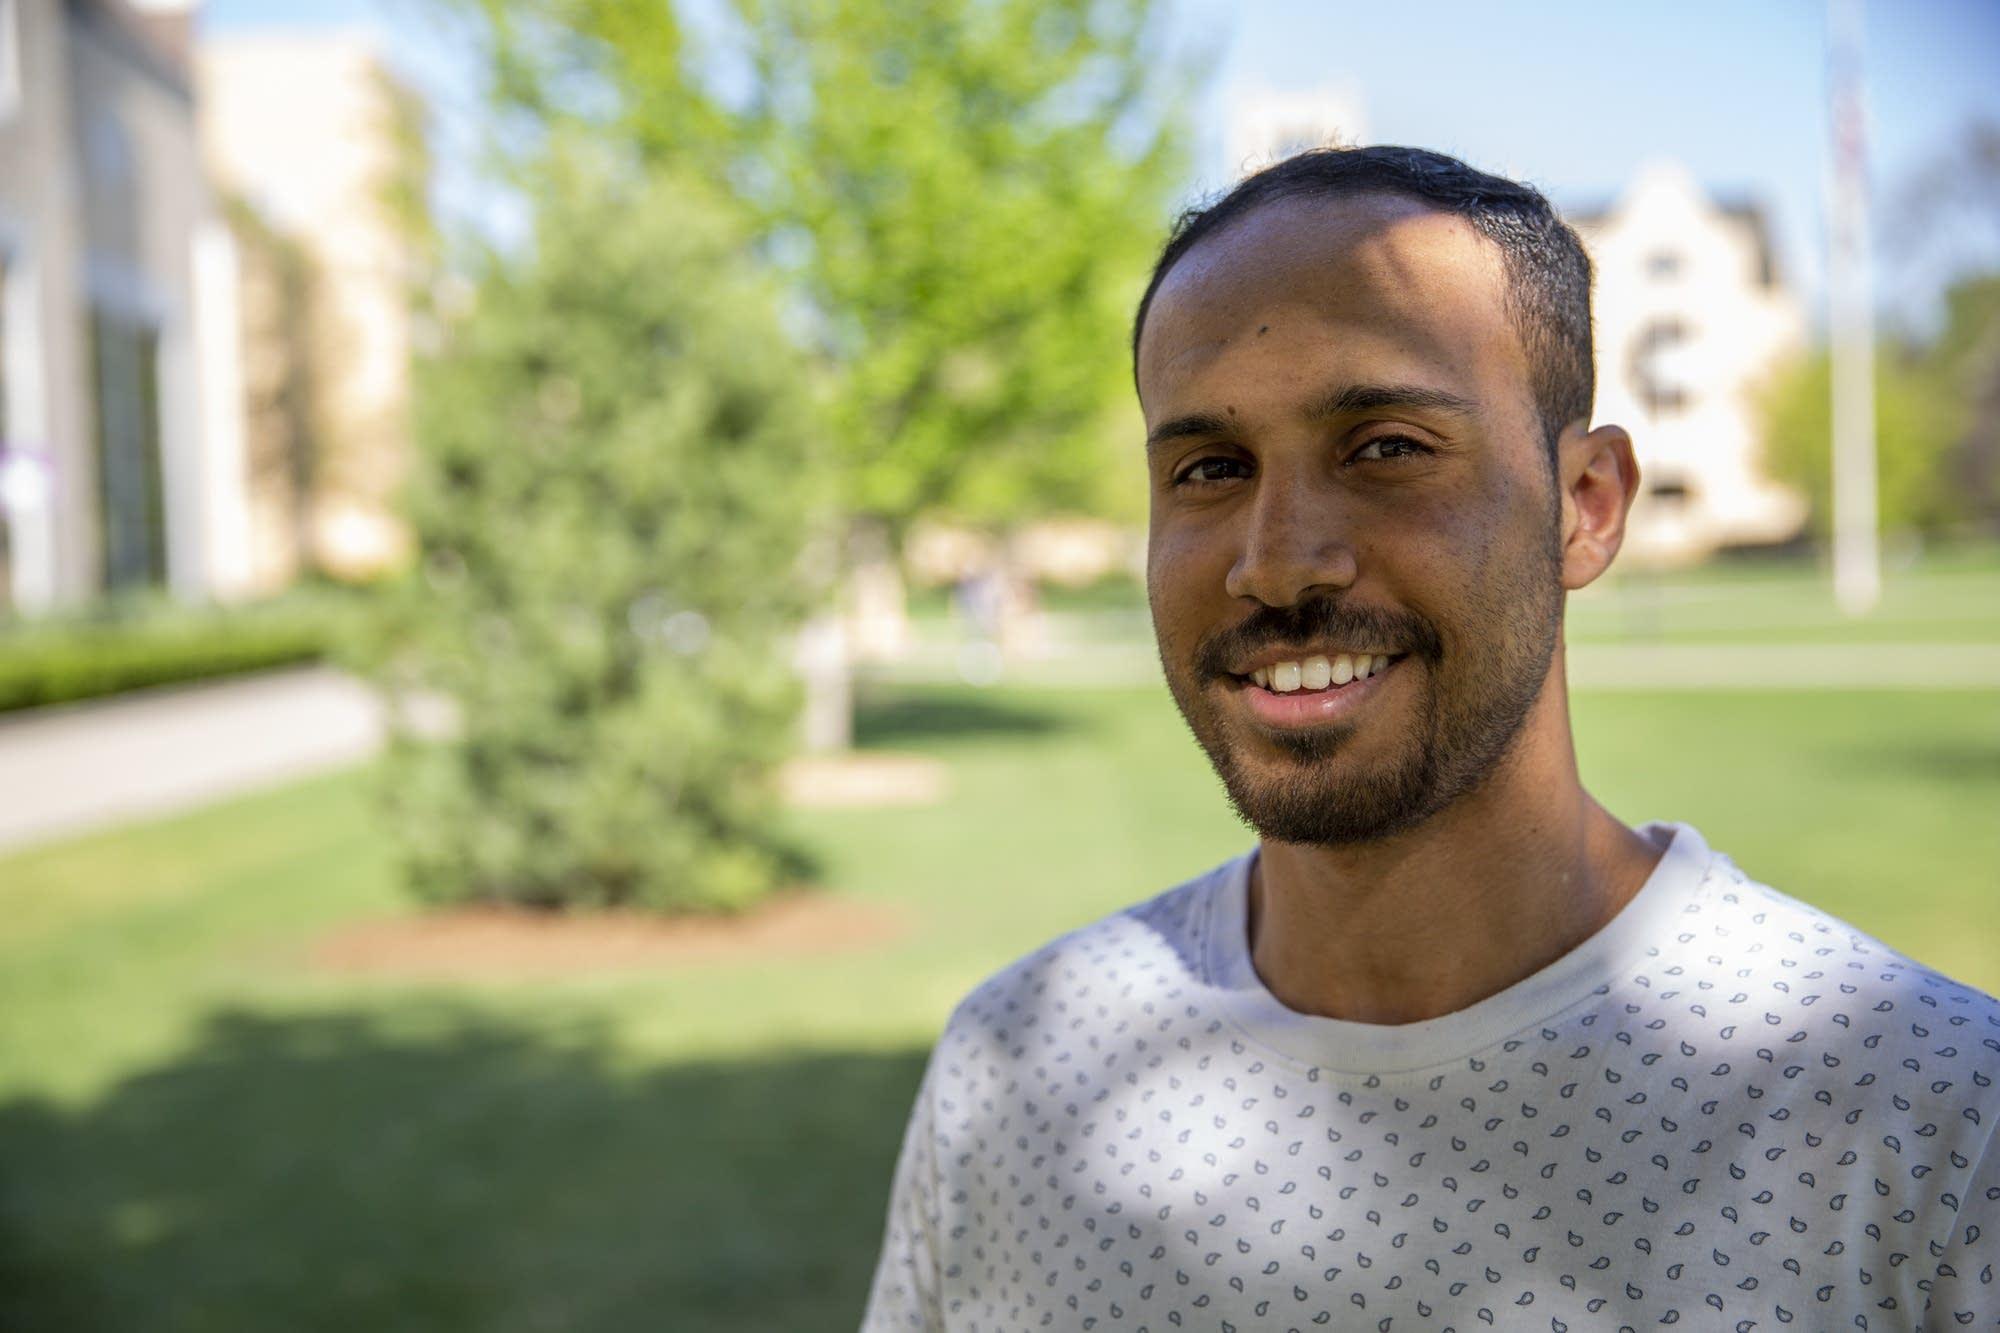 University of St. Thomas senior Mohamed Malim stands for a portrait